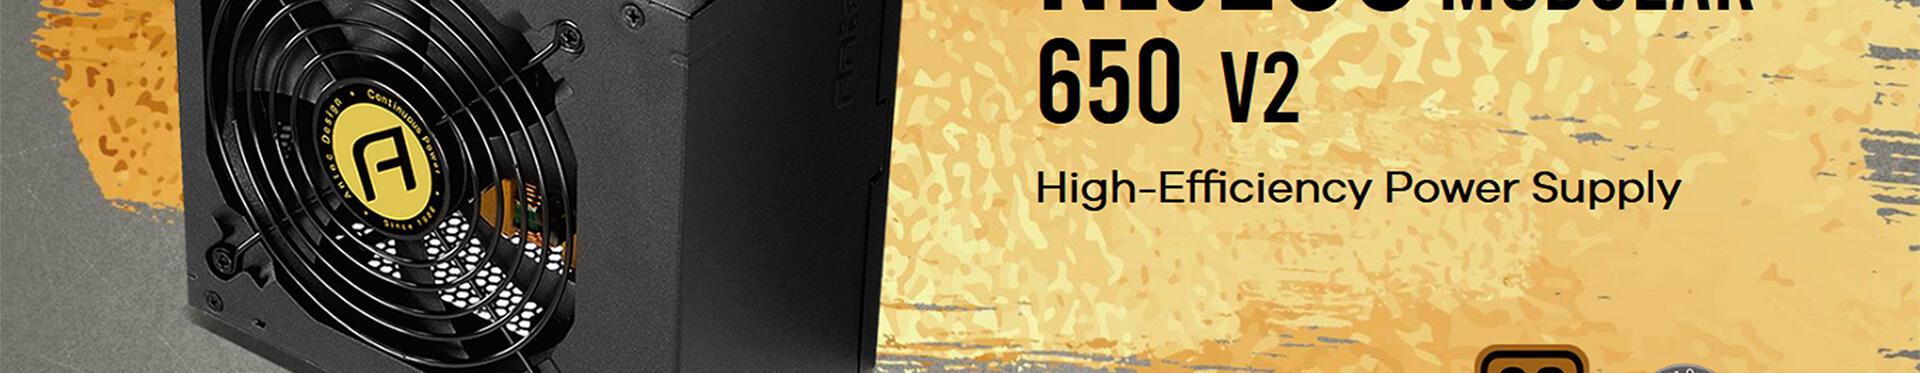 NeoECO-Modular-650-V2---antec_02.jpg